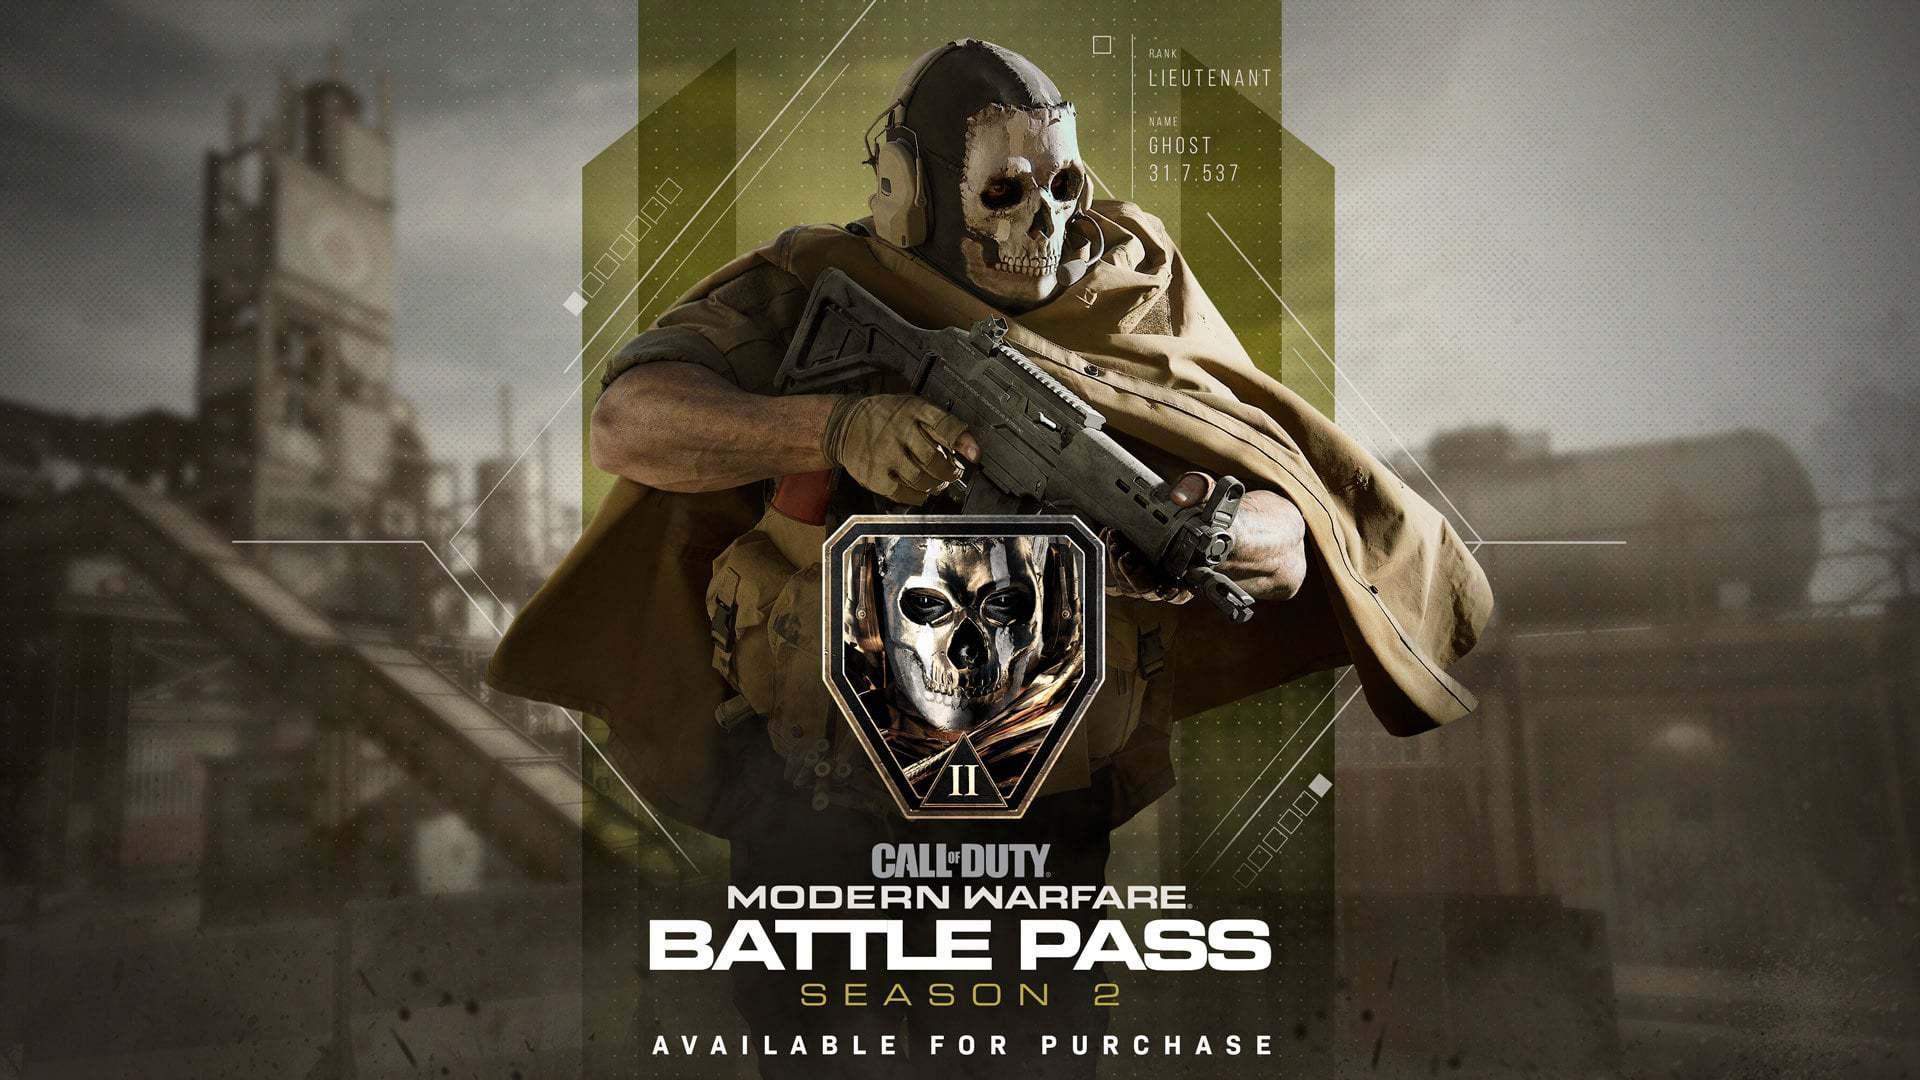 Call Of Duty Modern Warfare To Get Battle Royale Mode Warzone In